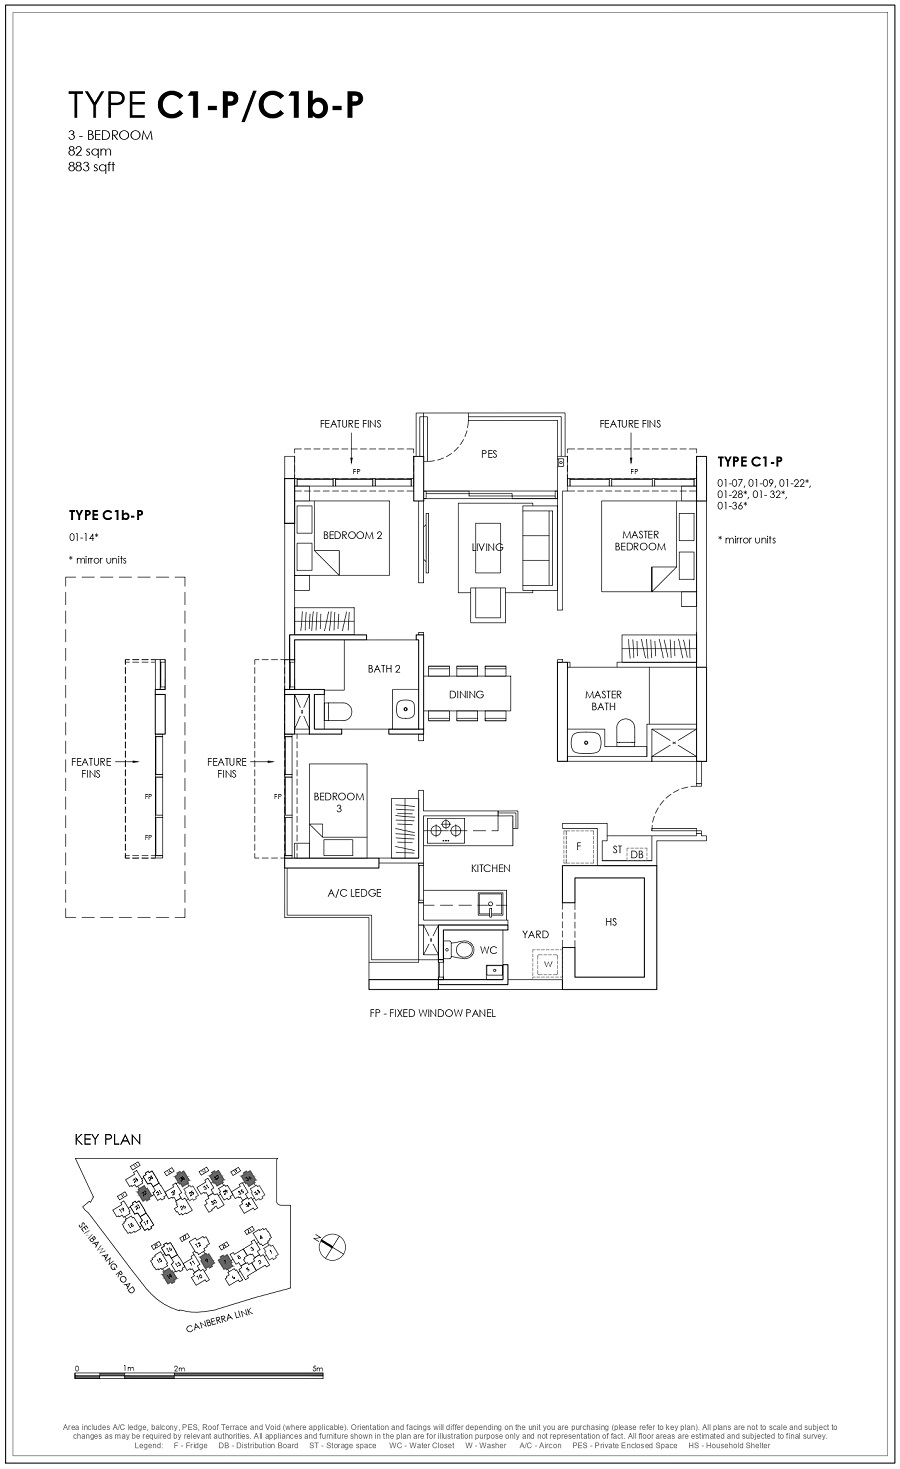 Provence Residence EC 3BR Type C1-P_C1b-P 82_883